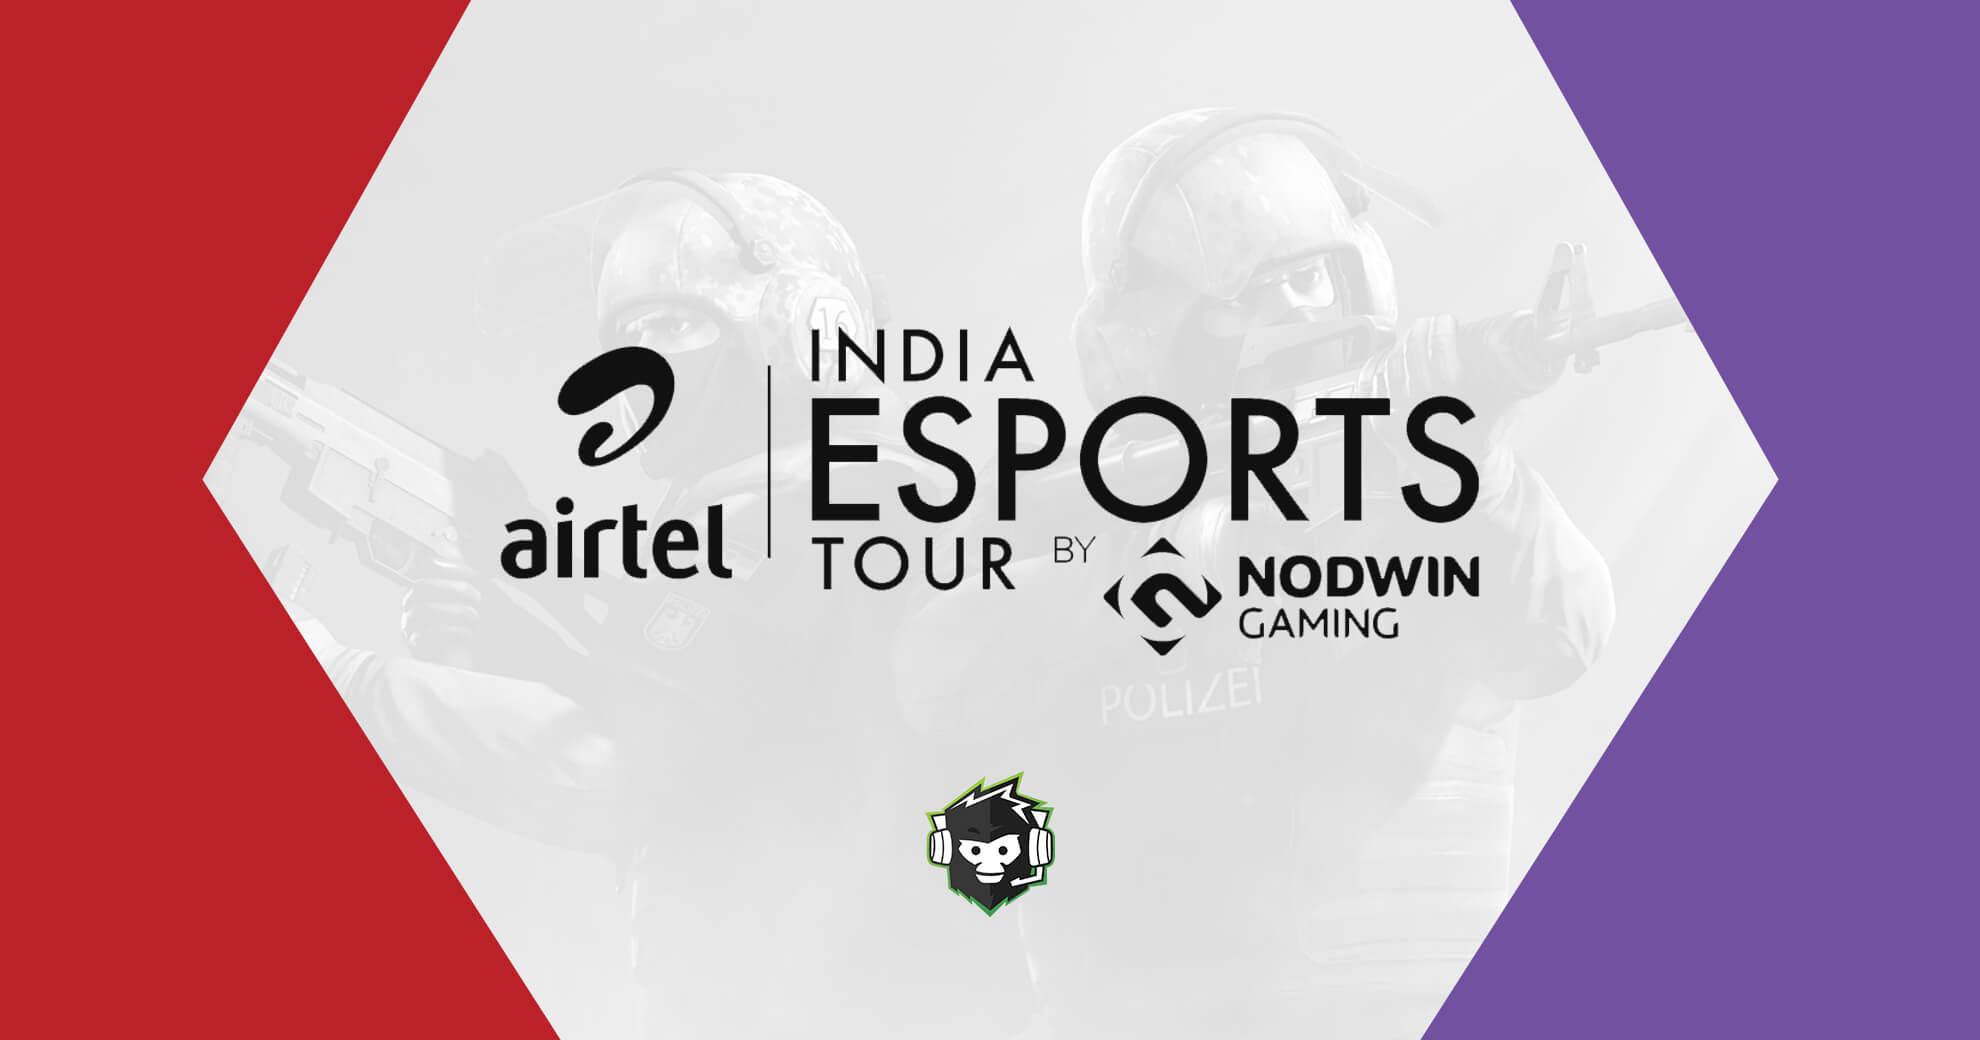 Call of Duty Mobile India Challenge Esports Tournament Now a Part of Airtel India Esports Tour